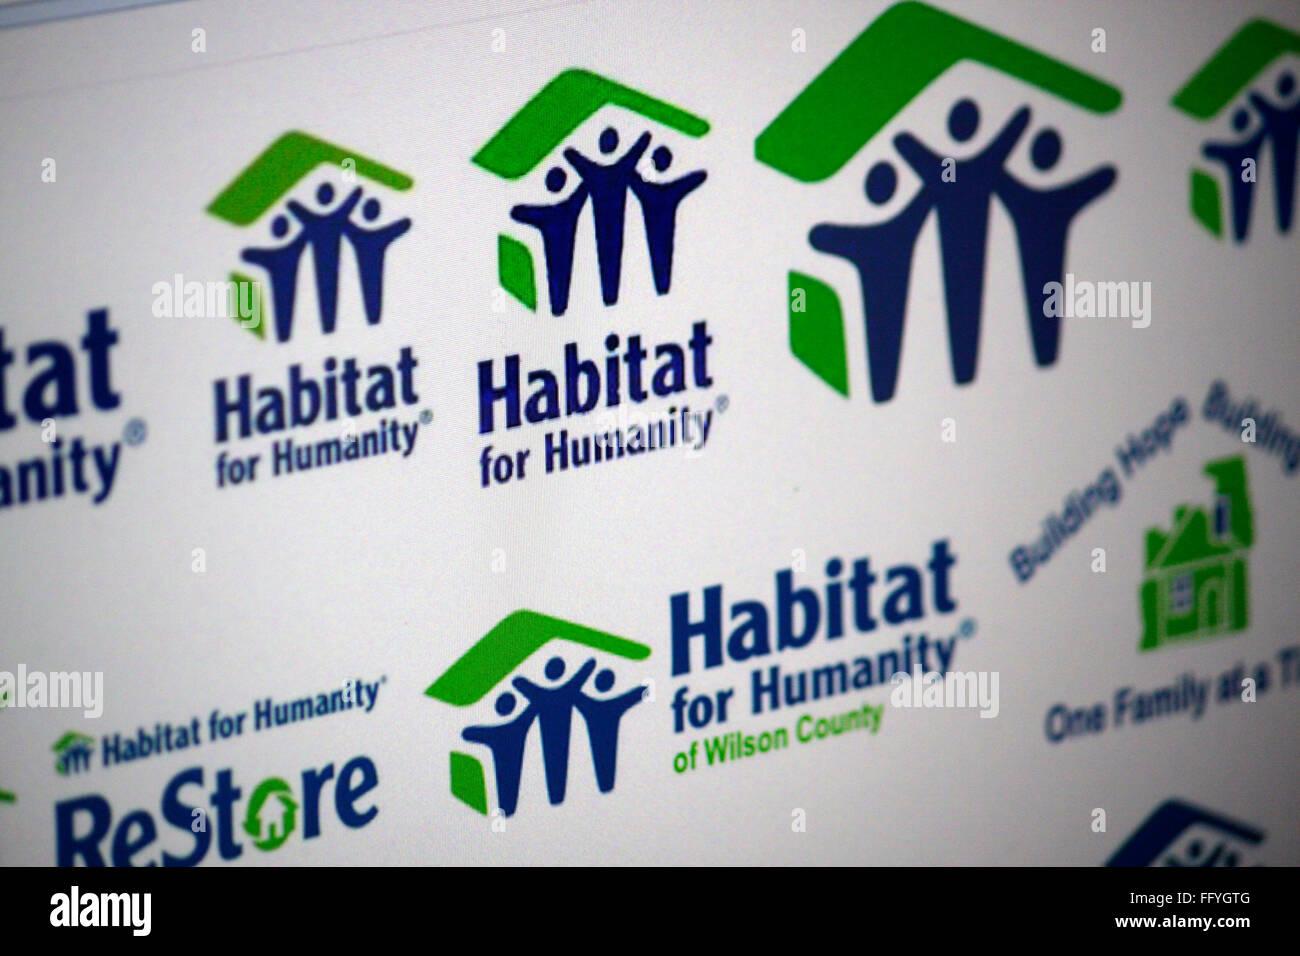 Markenname: 'Habitat for Humanity'. - Stock Image